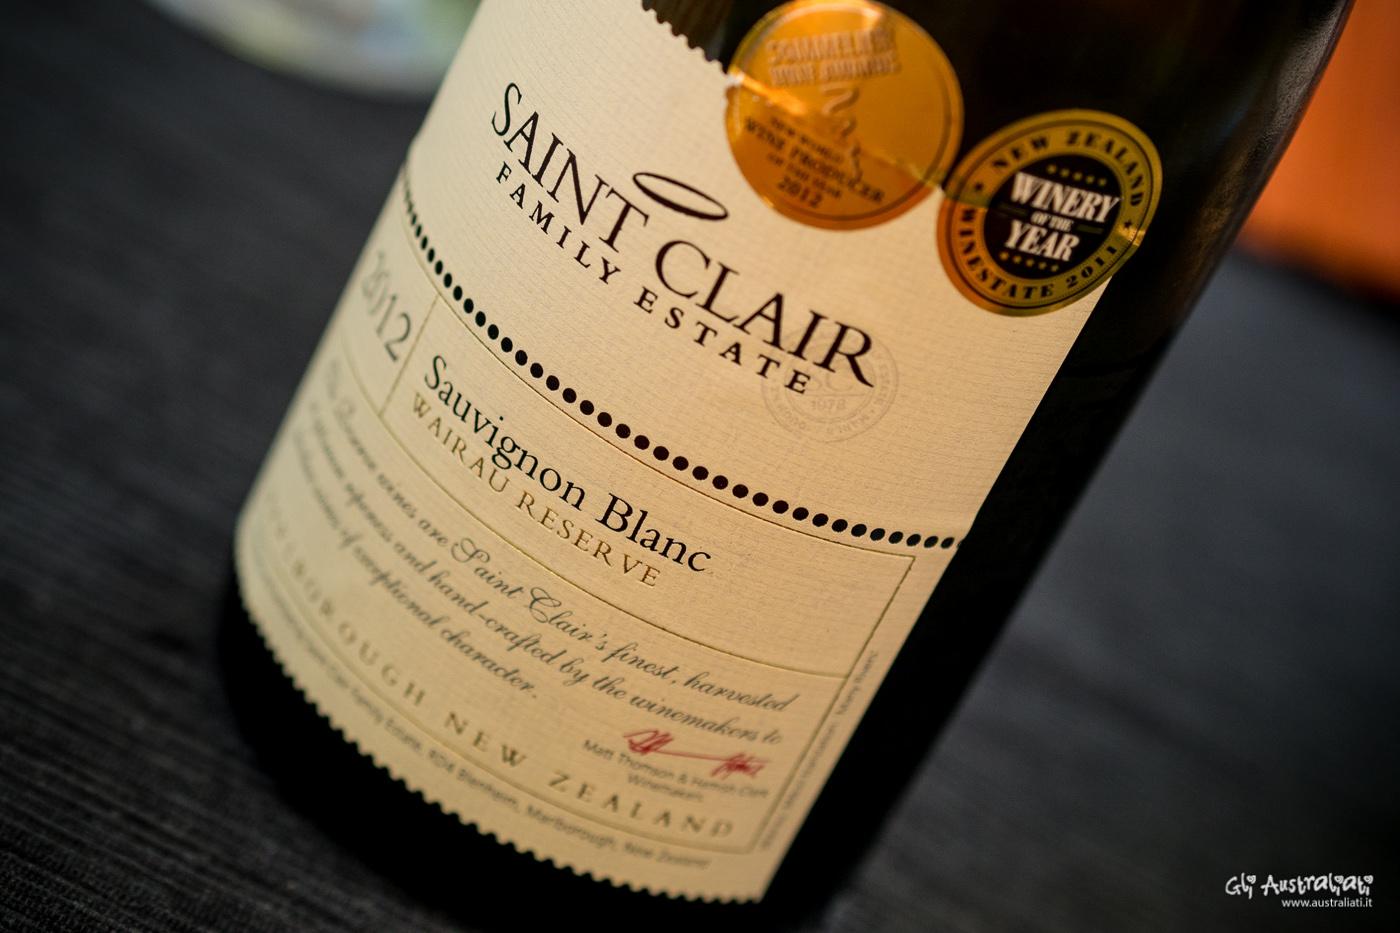 Saint Clair Sauvignon Blanc